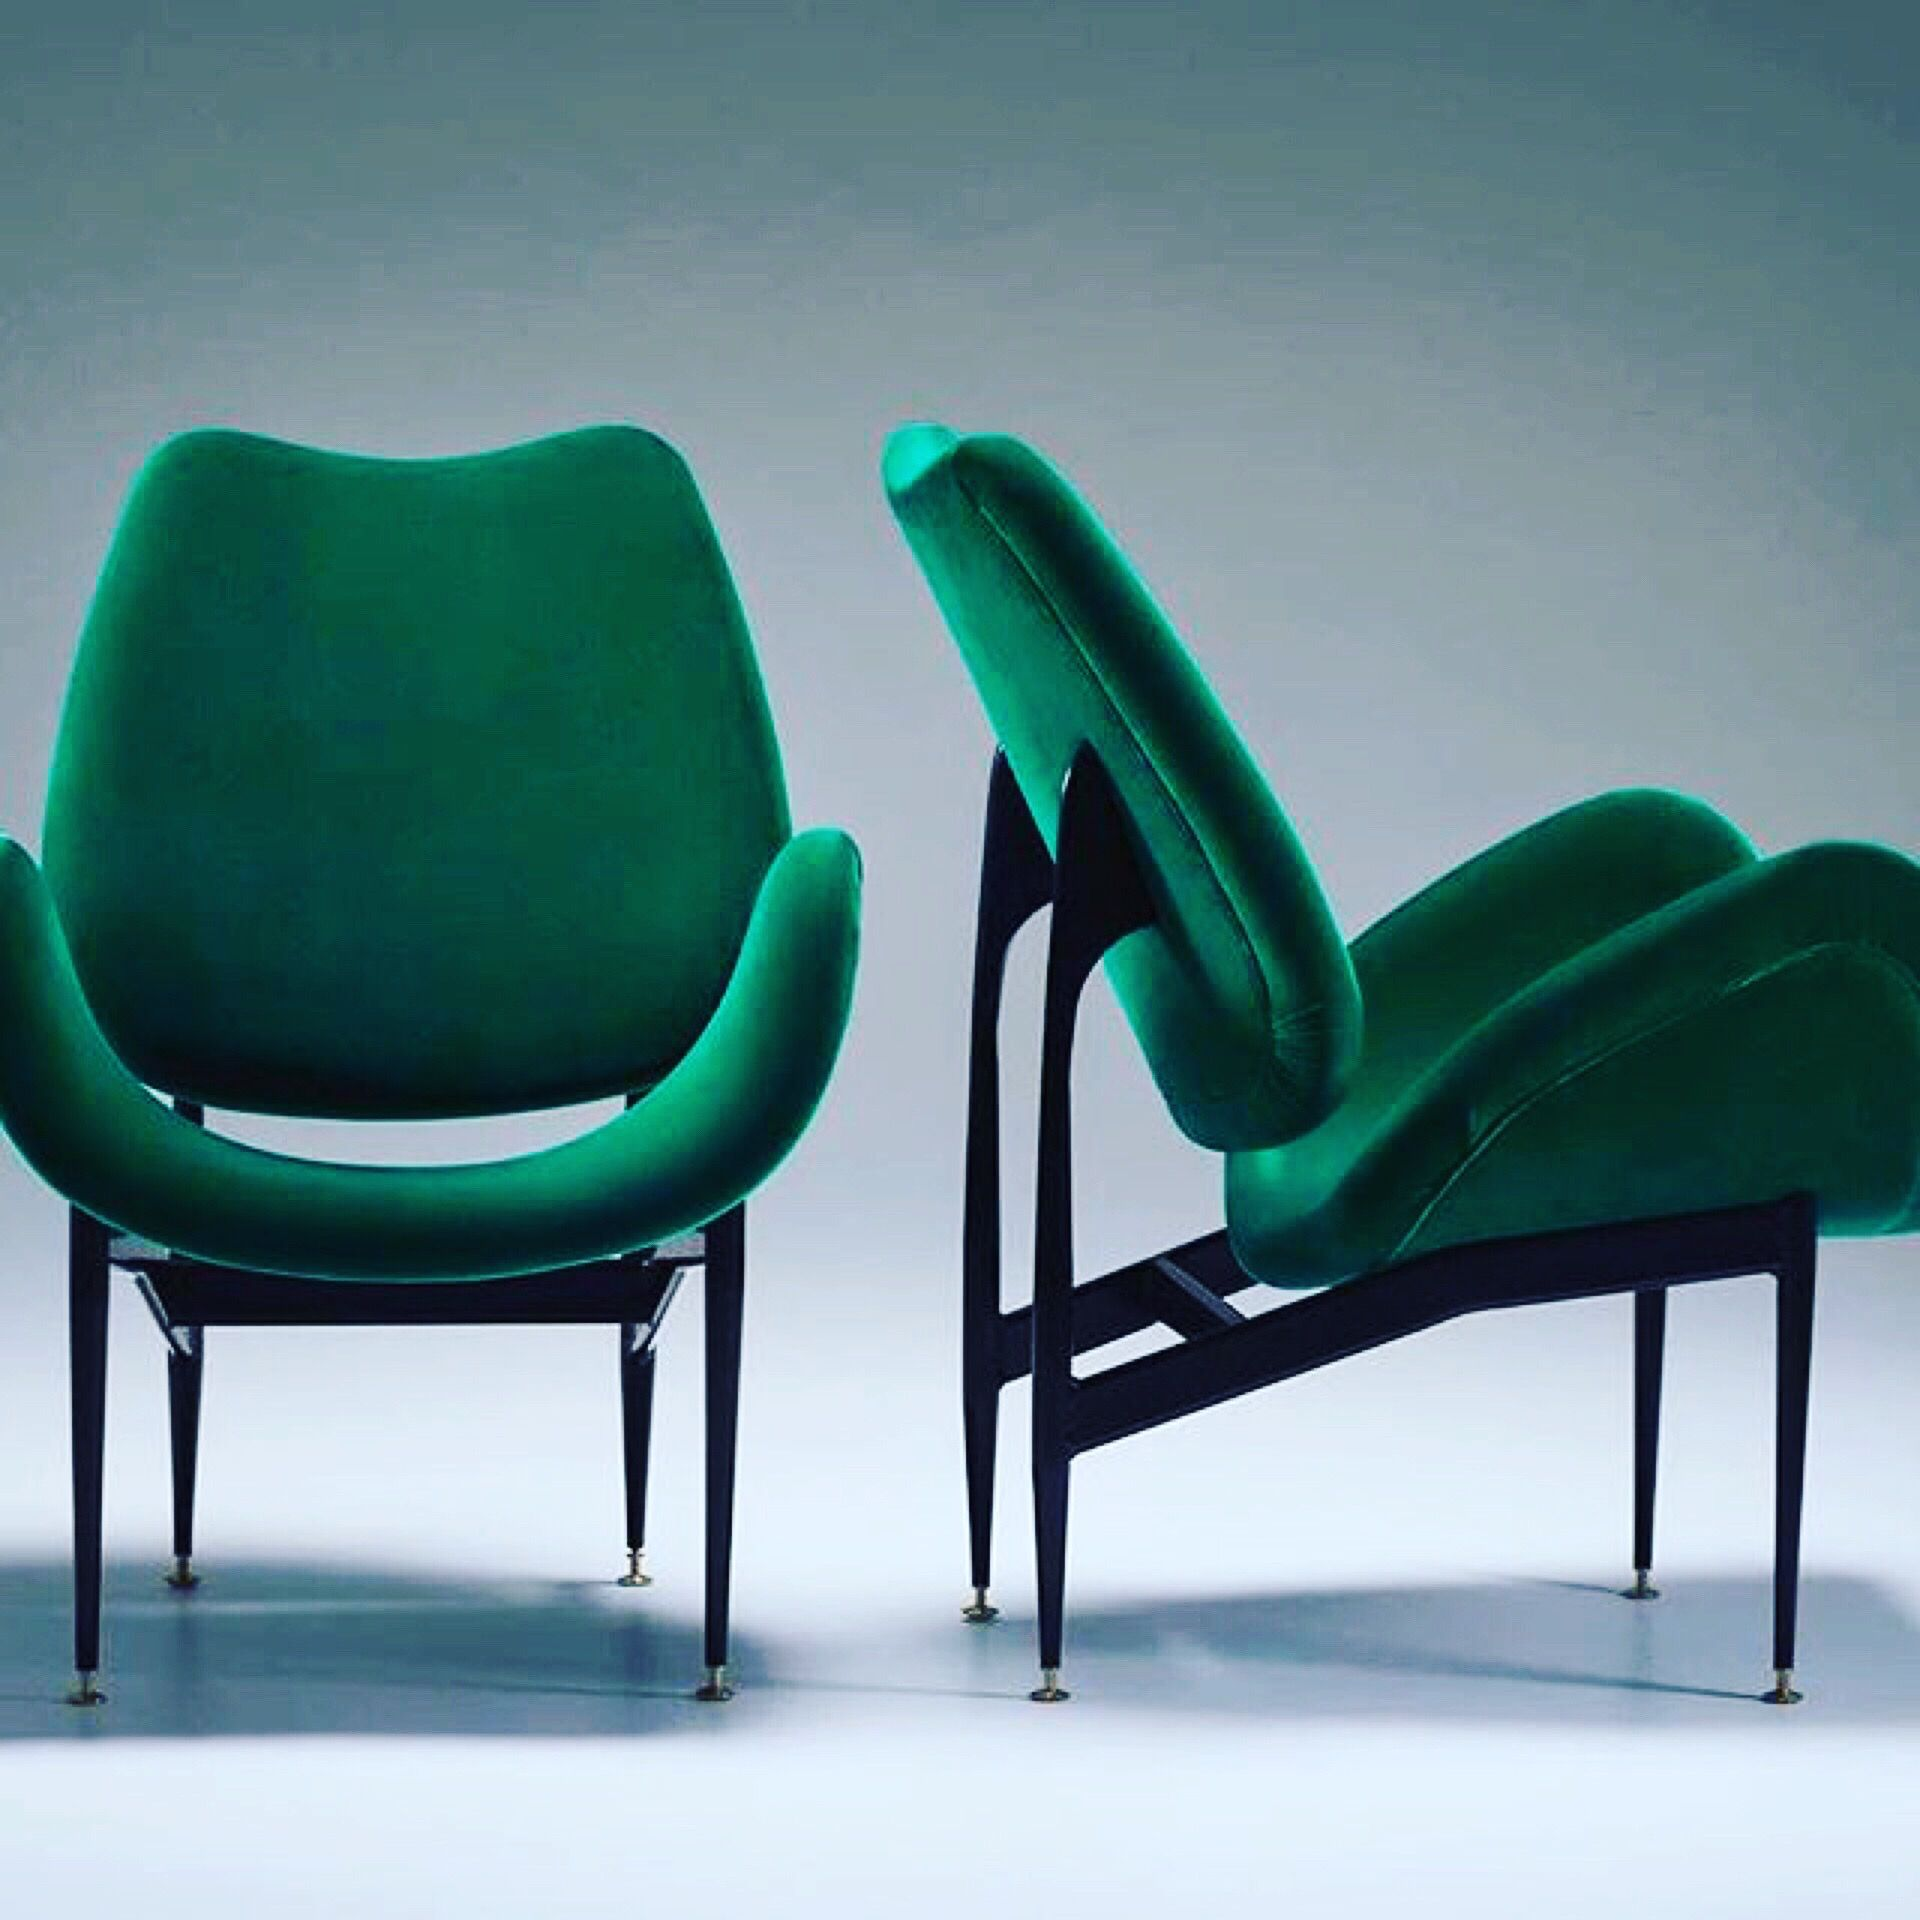 down under furniture. Sweet Vintage Midcentury Chair From Down Under, Mate Via @dc_hillier:Grant Featherston\u0027s \u0027Scape\u0027 Made In Australia The 1950\u0027s. Under Furniture